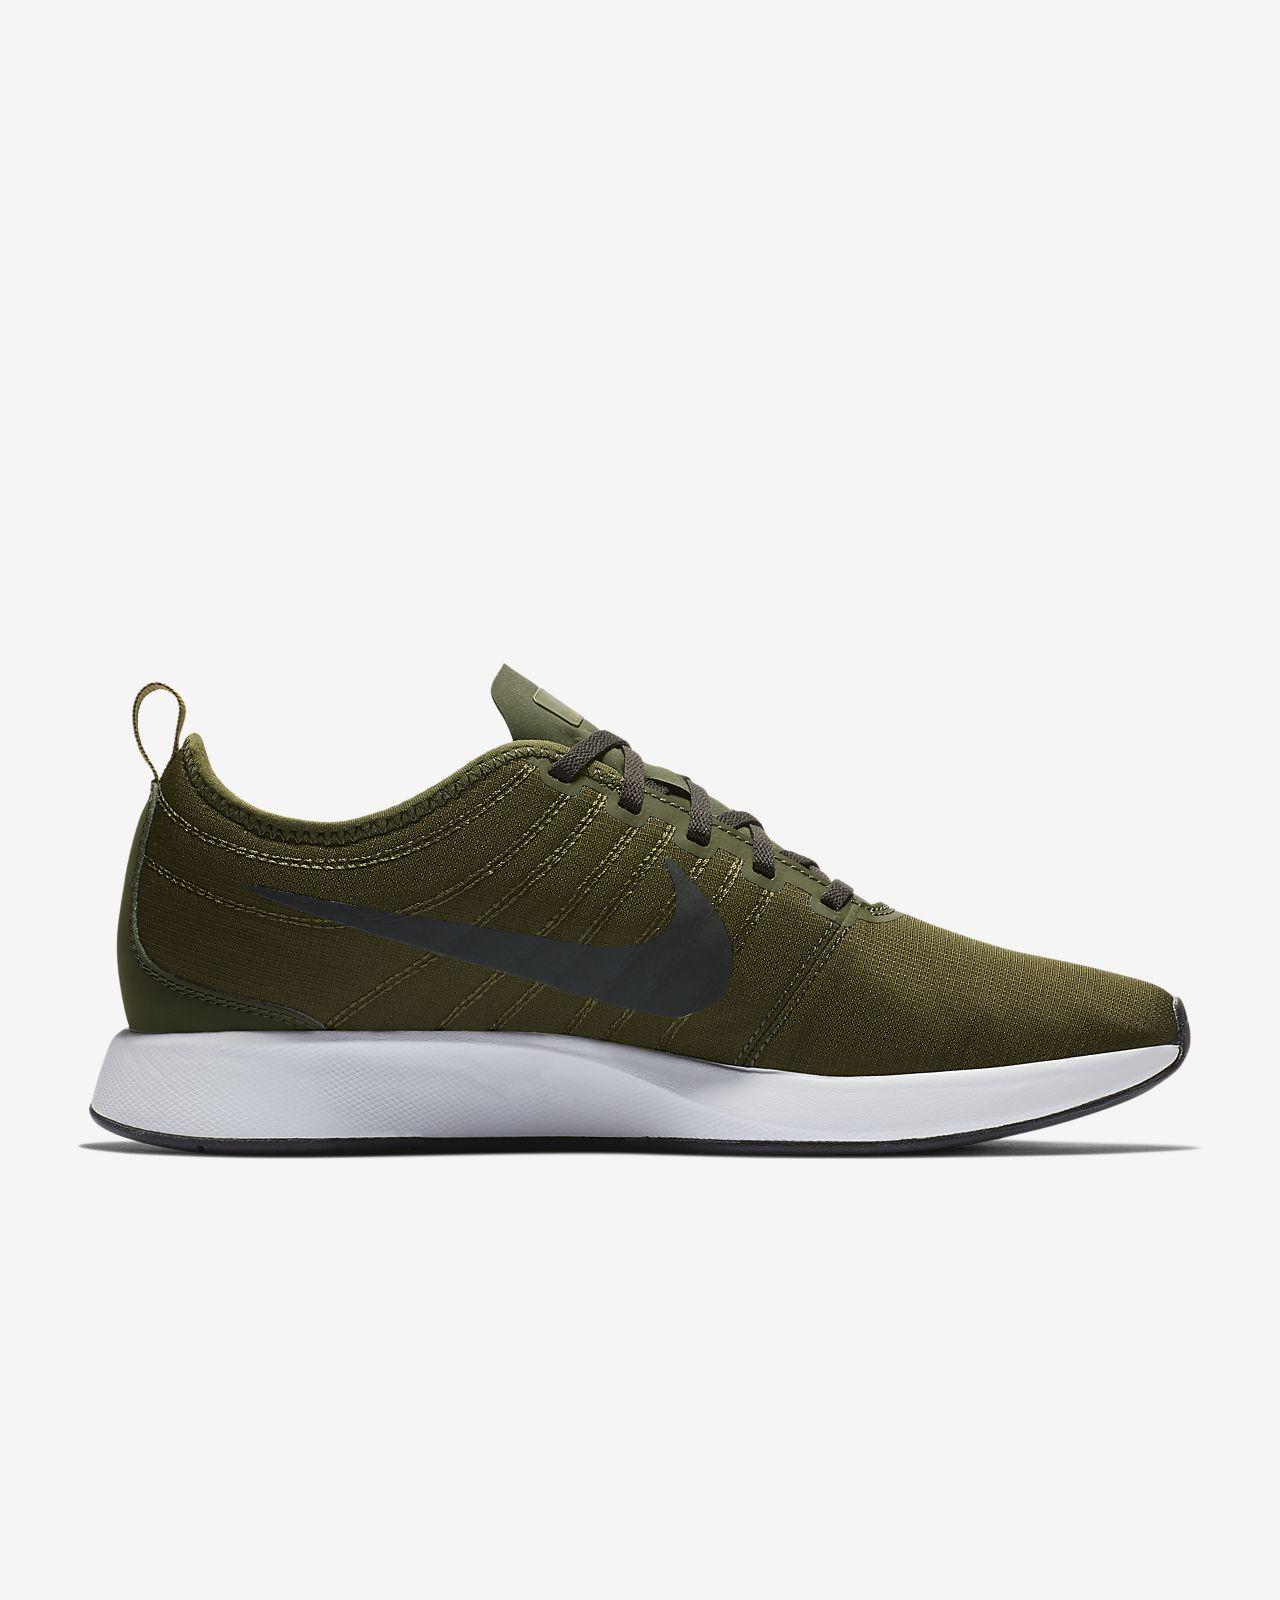 online store 68b34 1065d ... Nike Dualtone Racer Men s Shoe